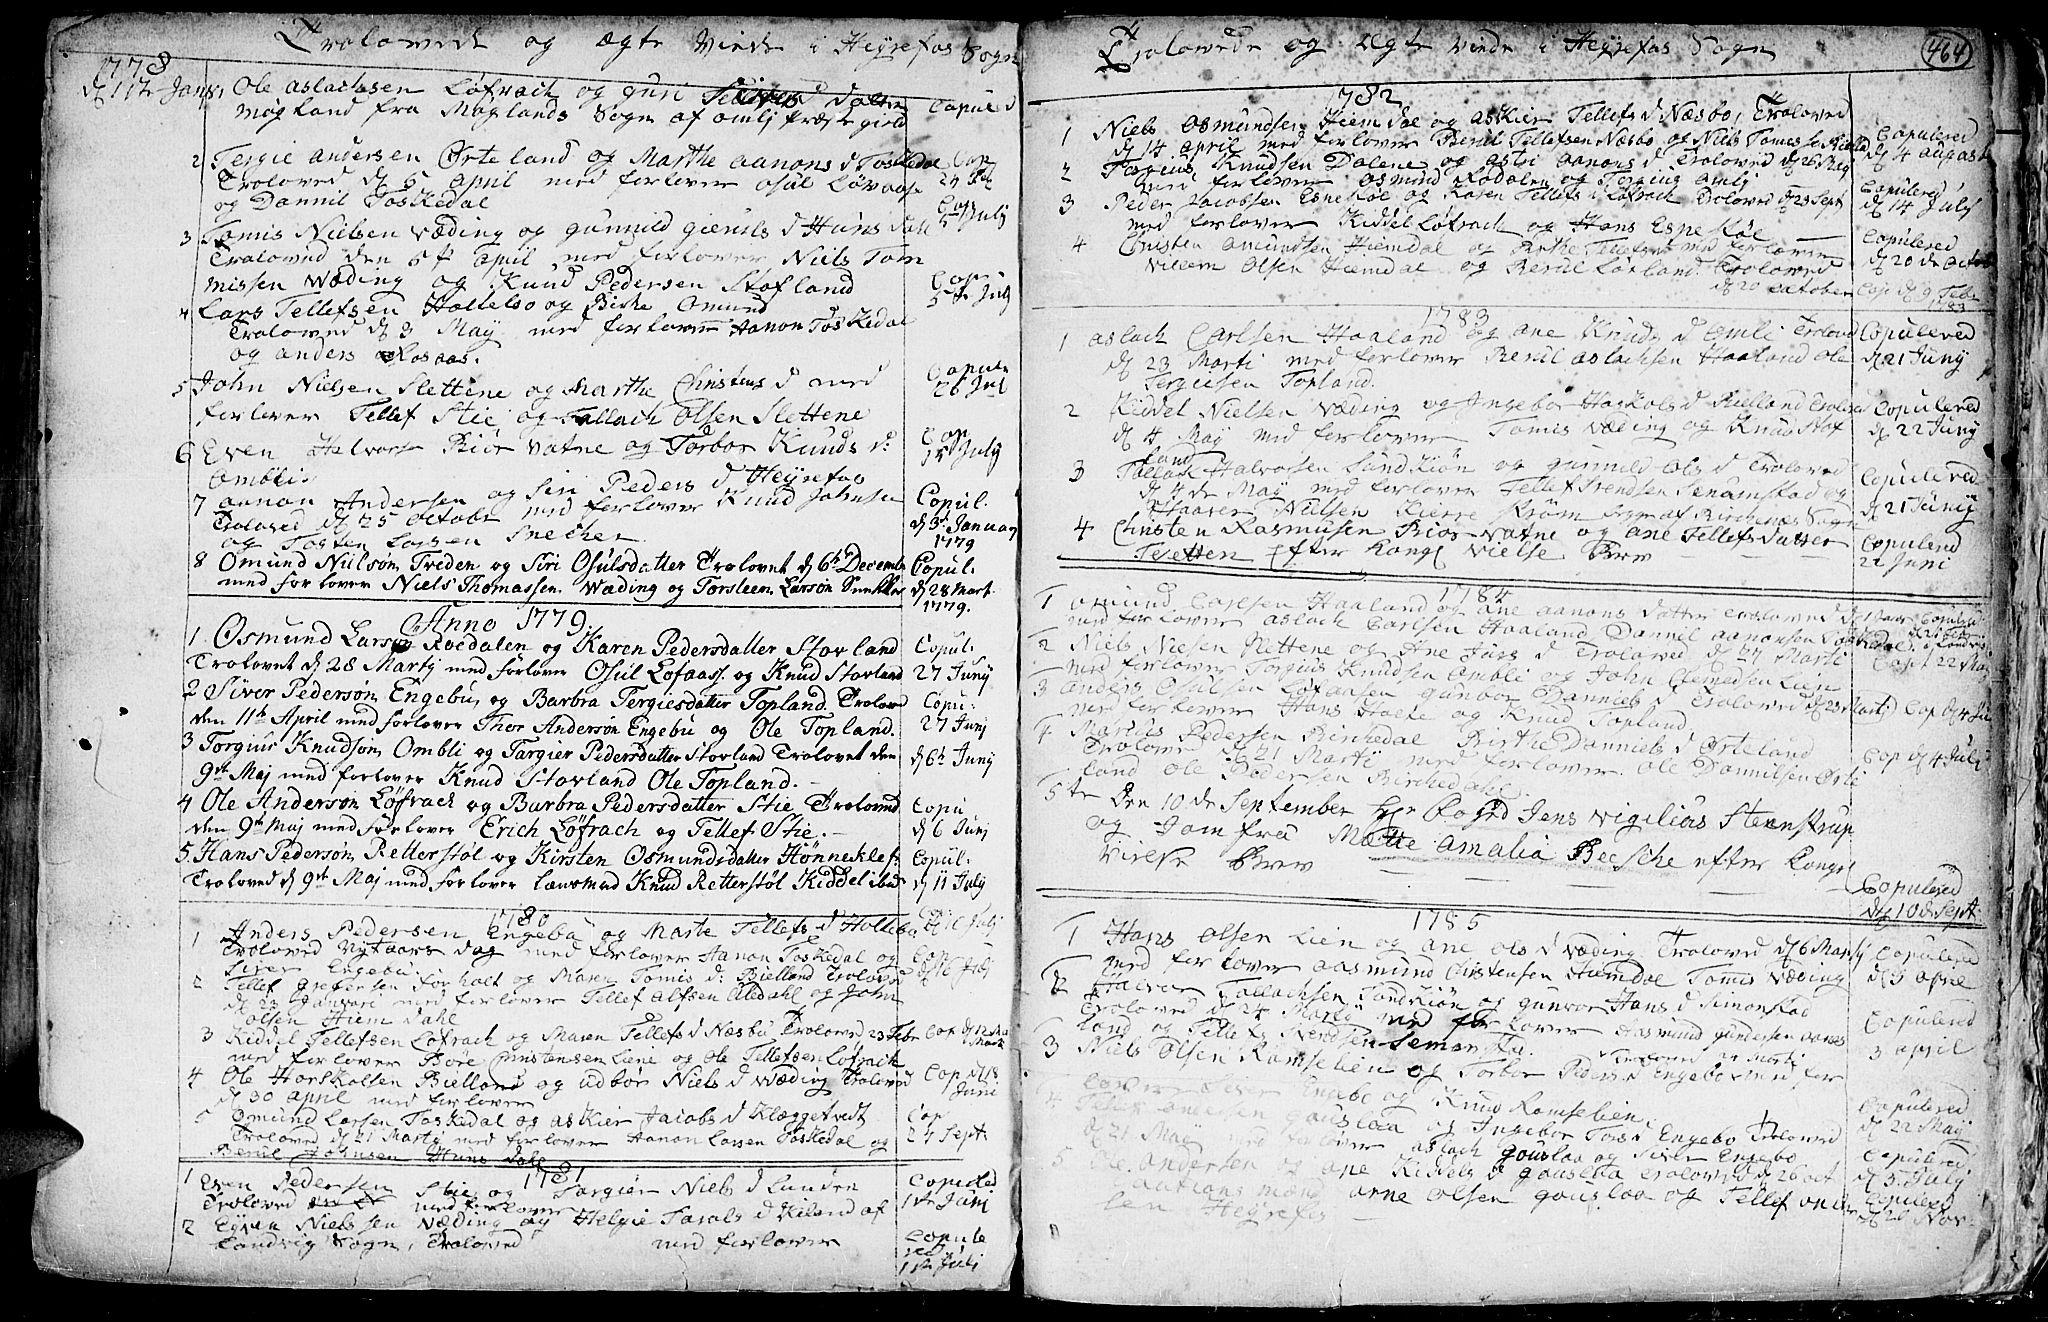 SAK, Hommedal sokneprestkontor, F/Fa/Fab/L0002: Ministerialbok nr. A 2 /3, 1740-1821, s. 464